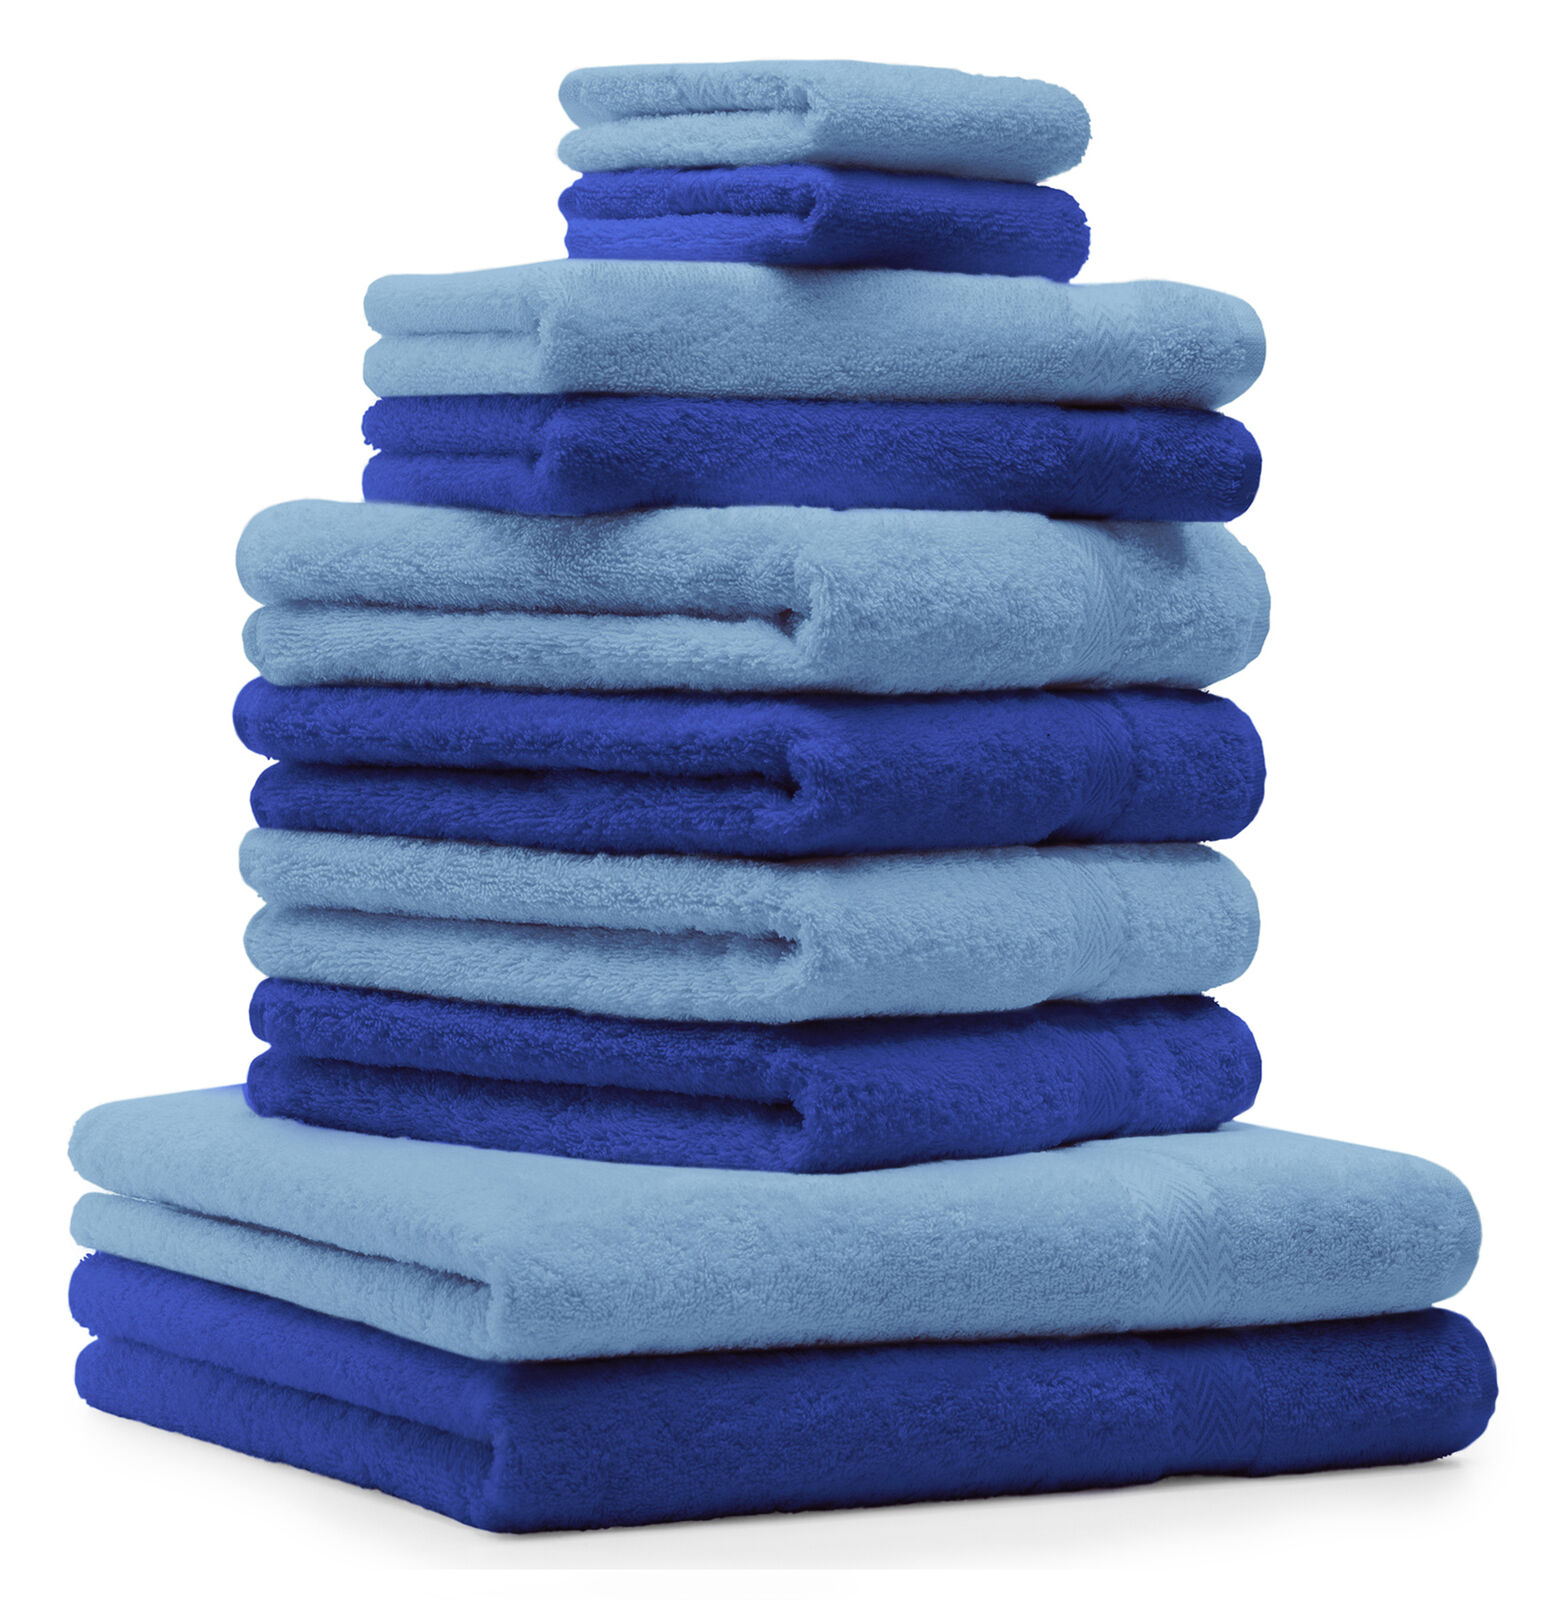 Betz 10-tlg. Handtuch Set Classic Farbe Royalblau & Hellblau     | Günstigen Preis